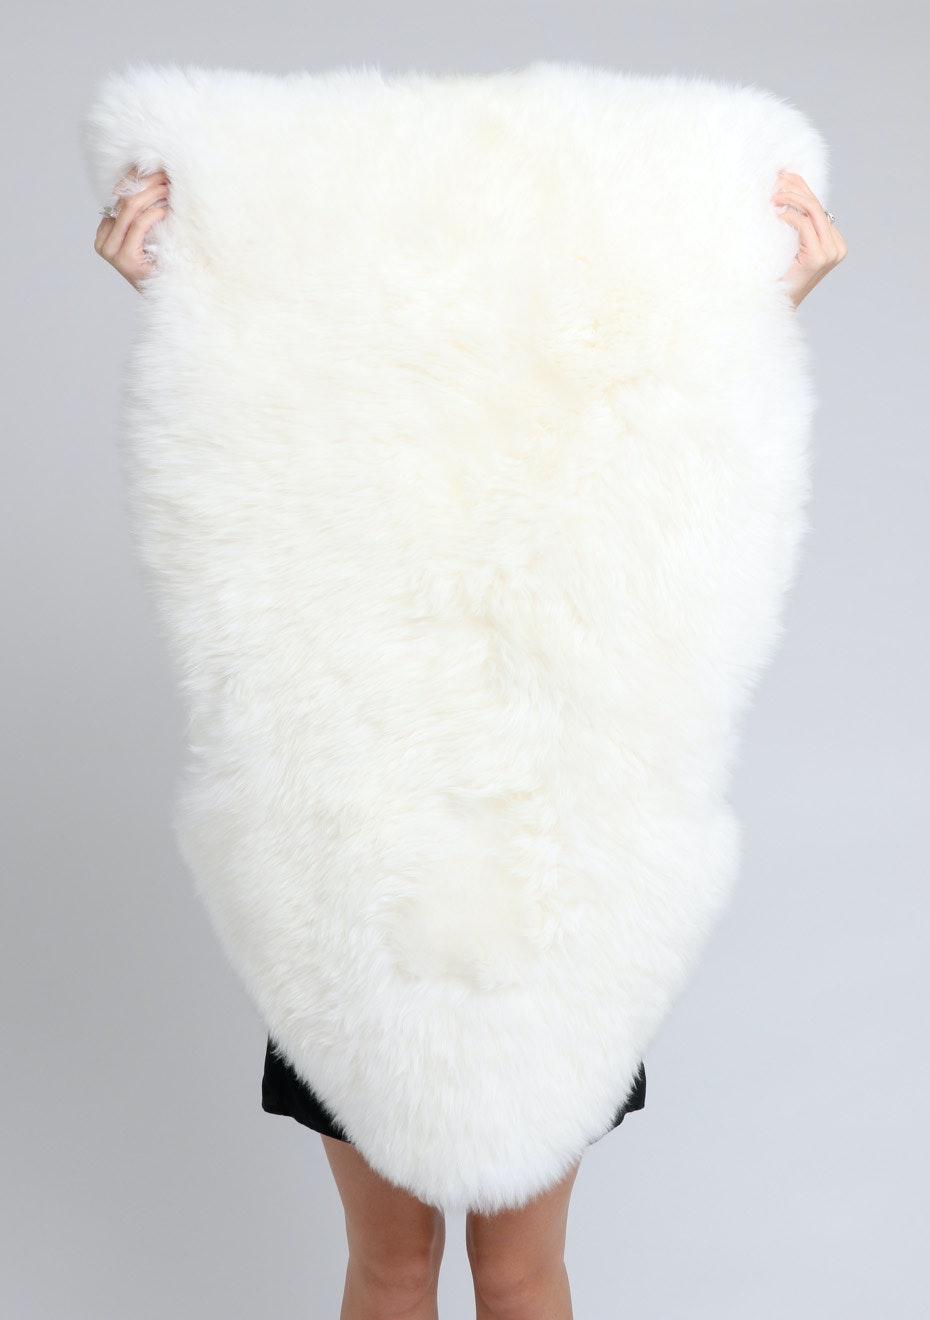 4 Star Creamy White Long Wool Sheepskin Rug